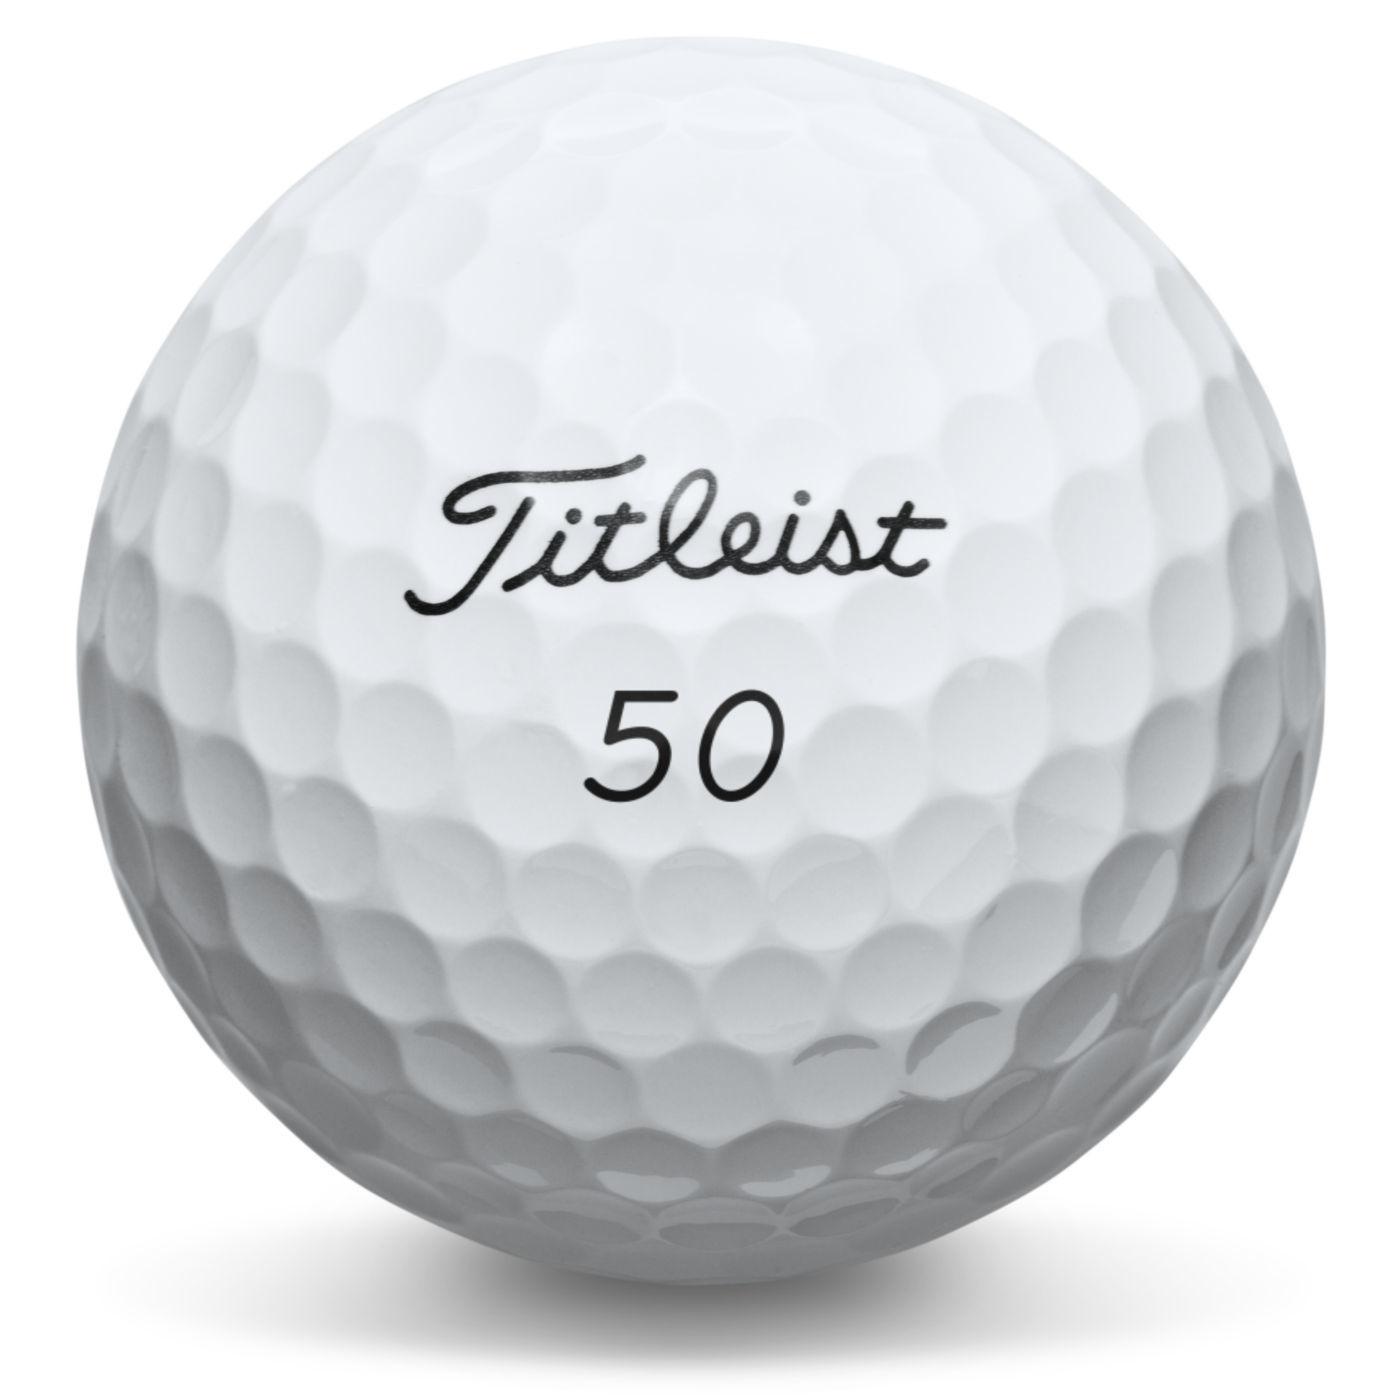 https://www.best4balls.com/pub/media/catalog/product/p/r/pro_v1_special_play_50_3.jpg